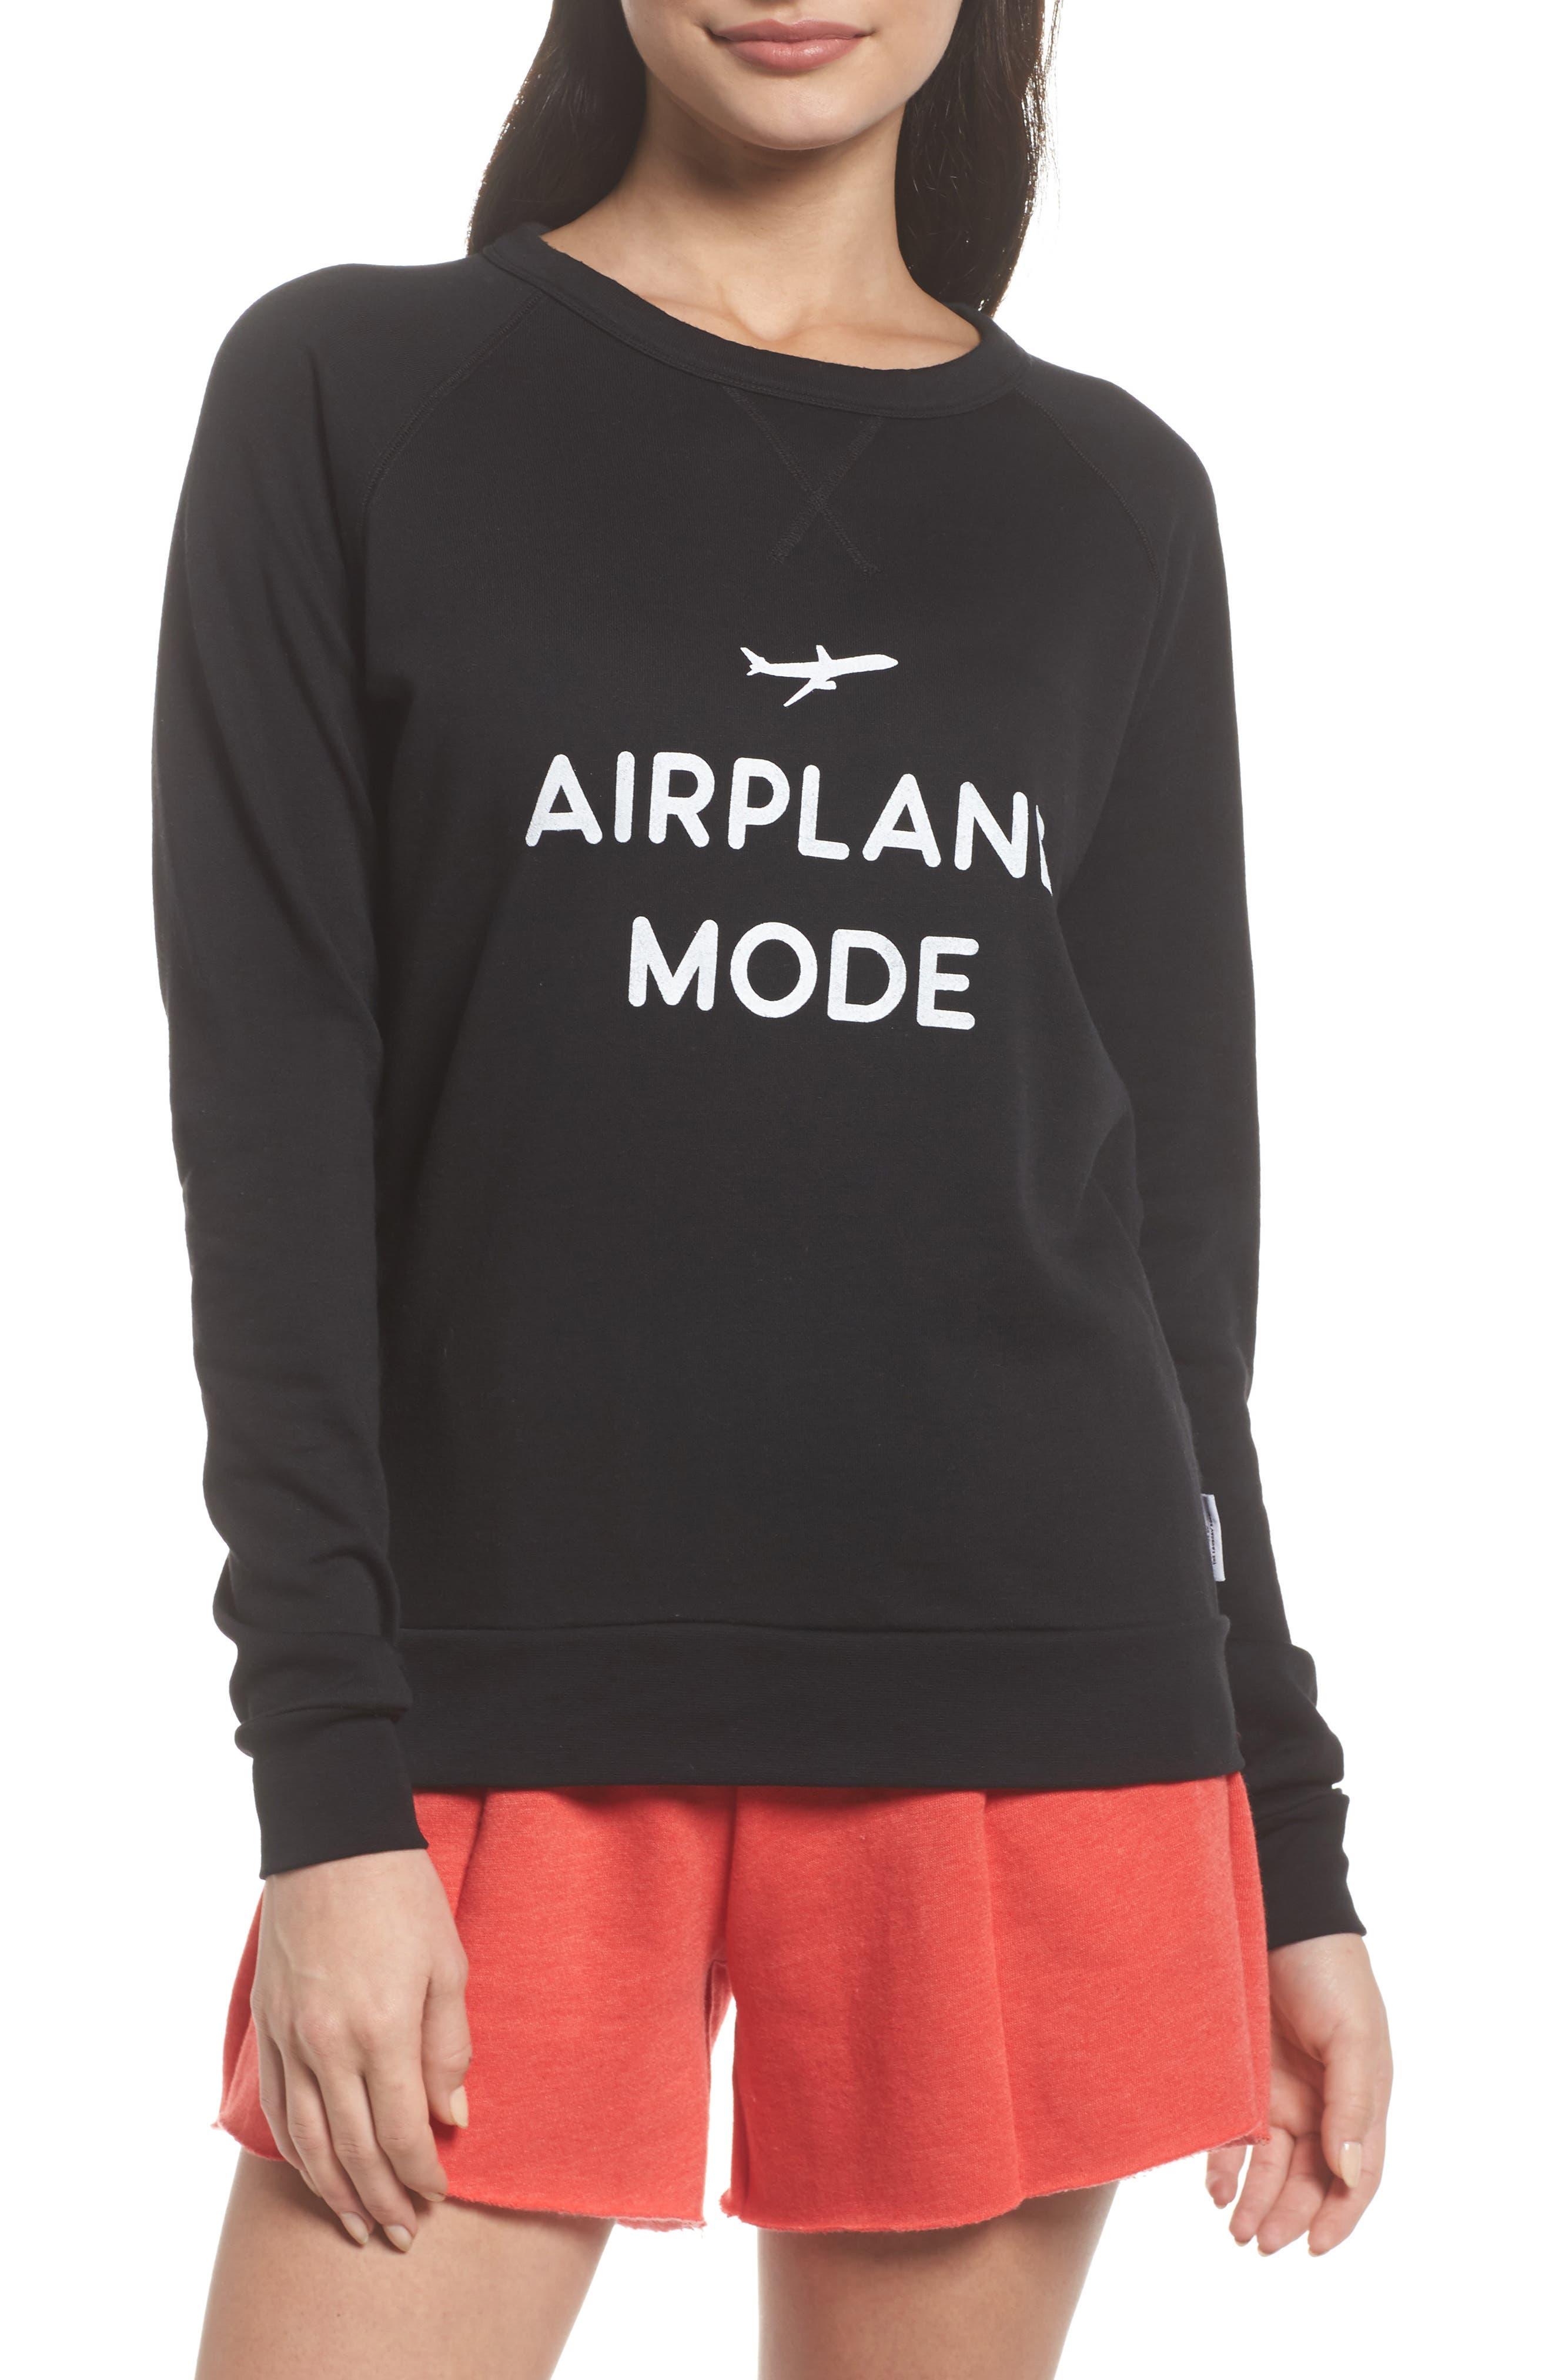 The Laundry Room Airplane Mode Cozy Lounge Sweatshirt